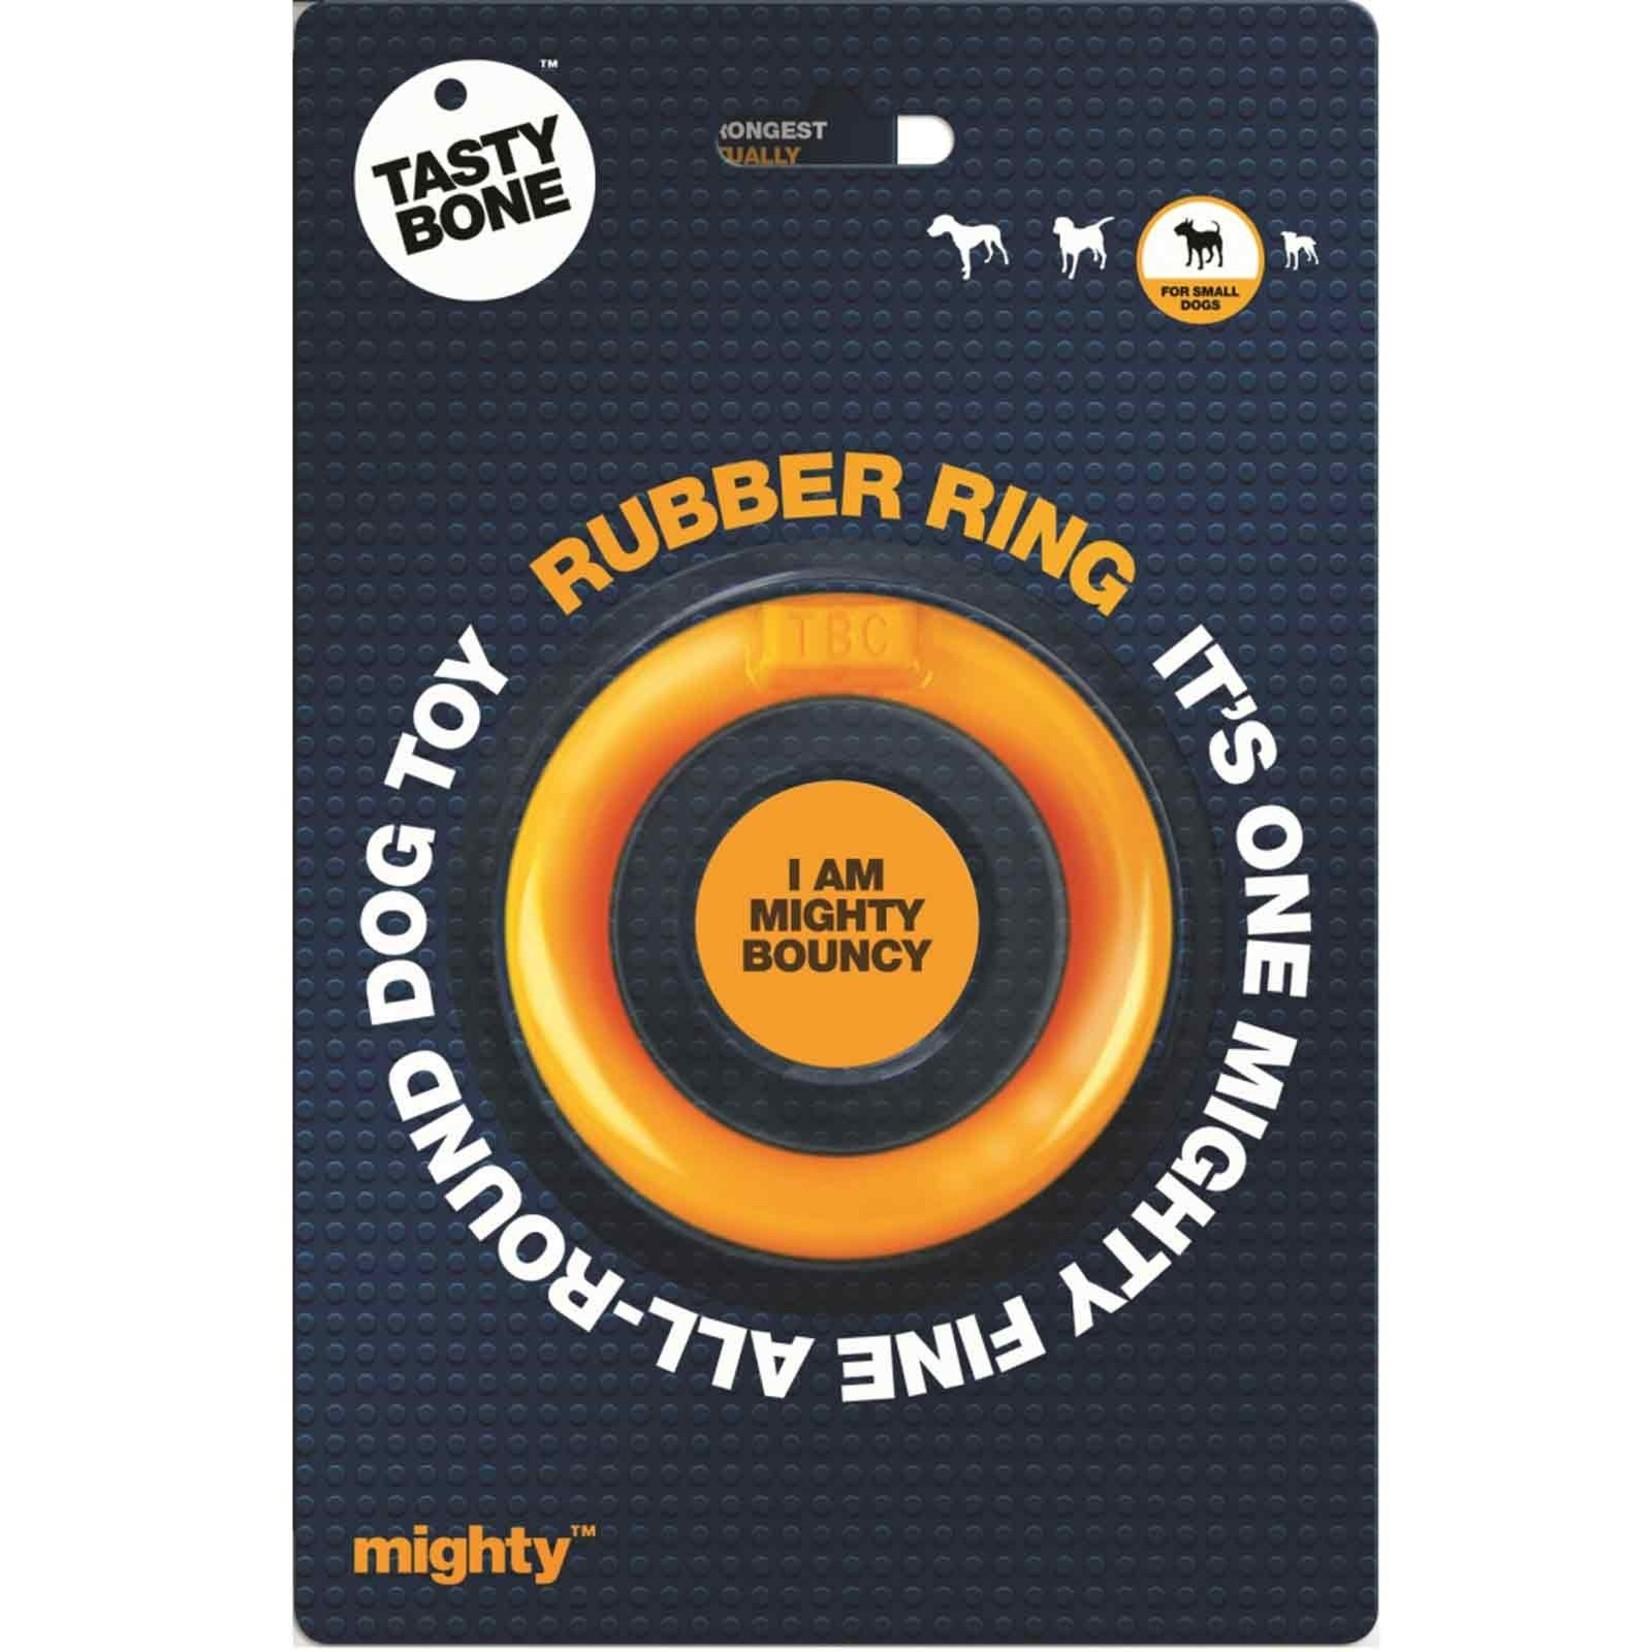 TastyBone Mighty Rubber Ring